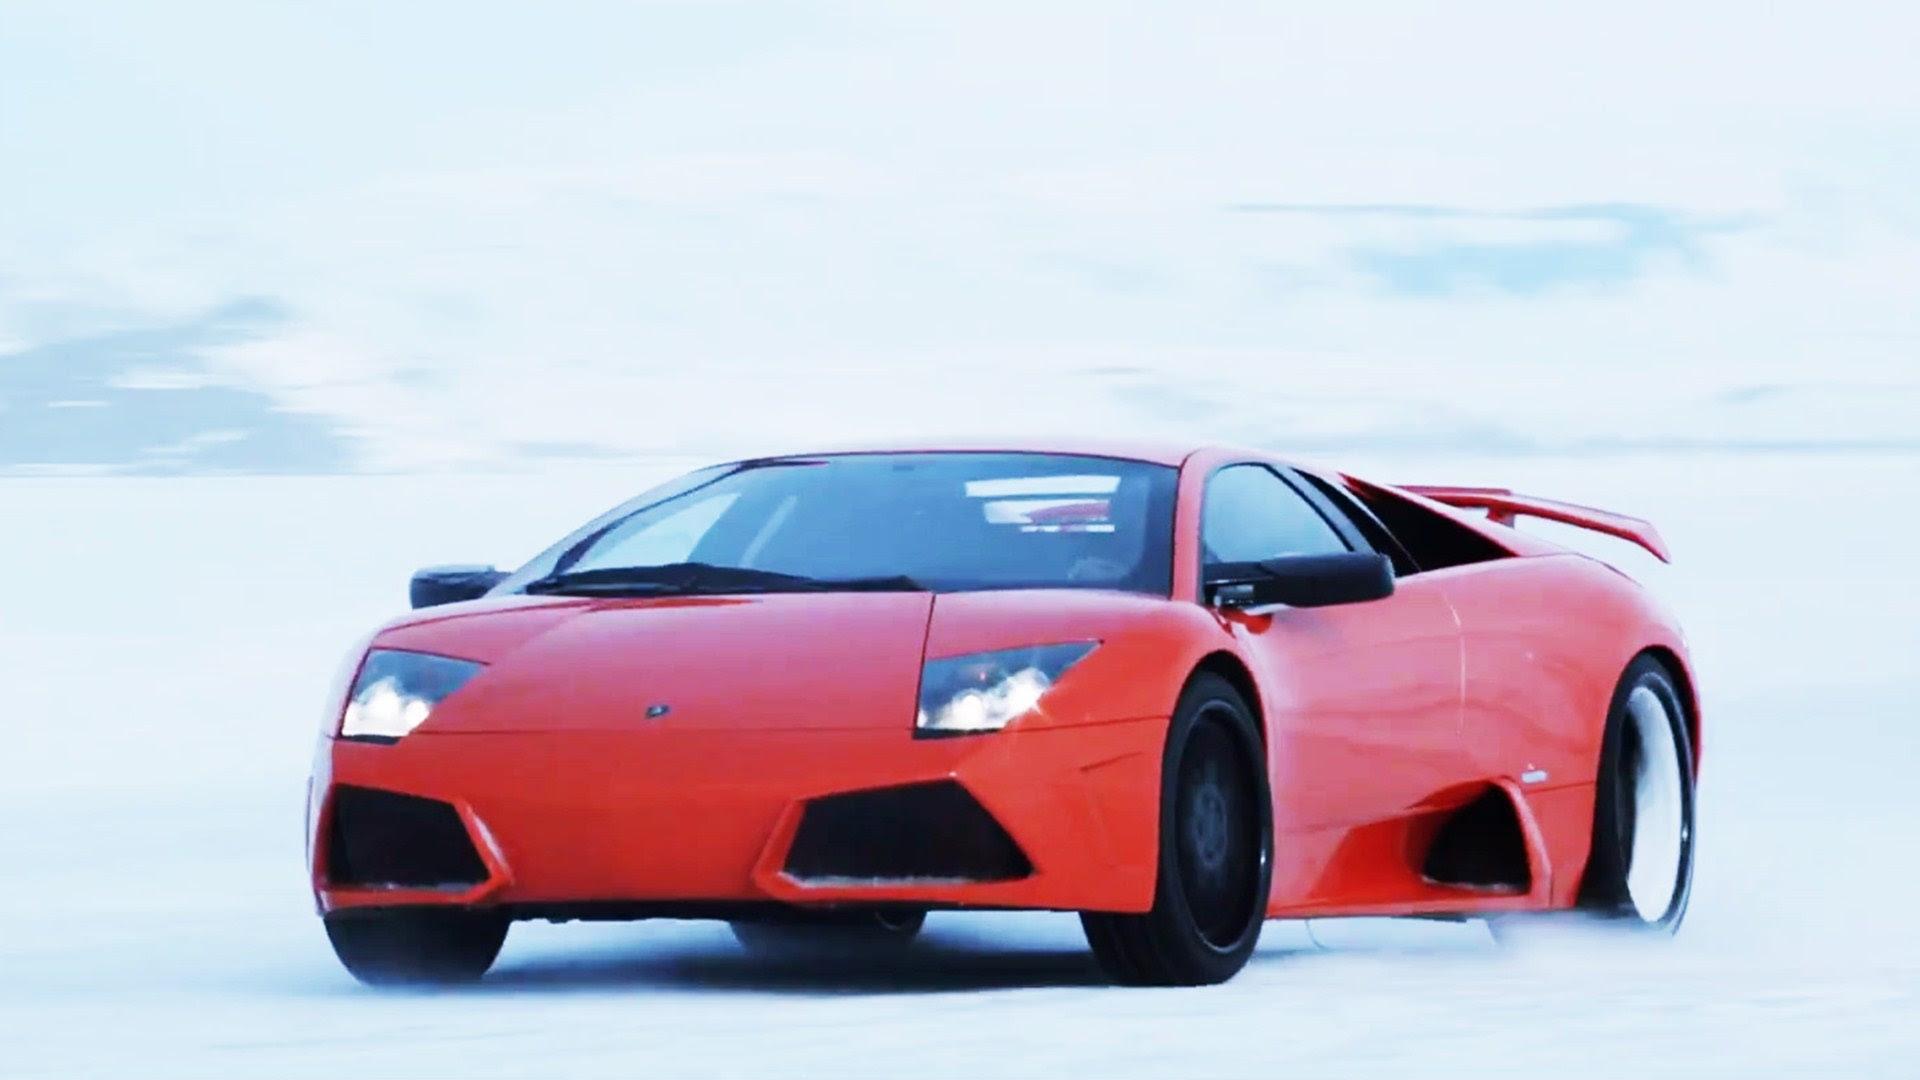 Fast Furious 8 Orange Lamborghini Wallpaper 11776 Baltana